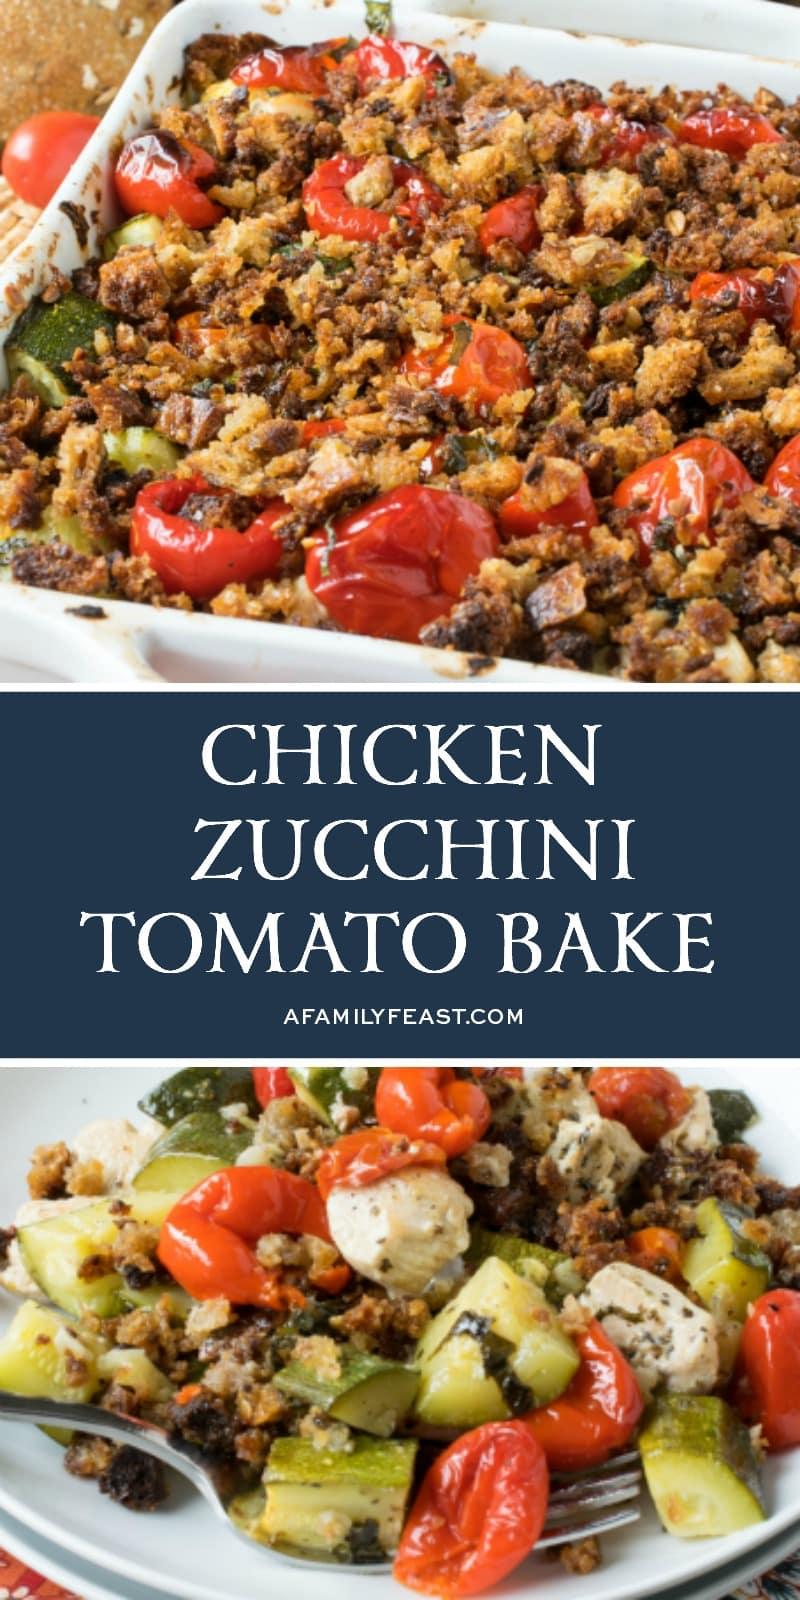 Chicken Zucchini Tomato Bake